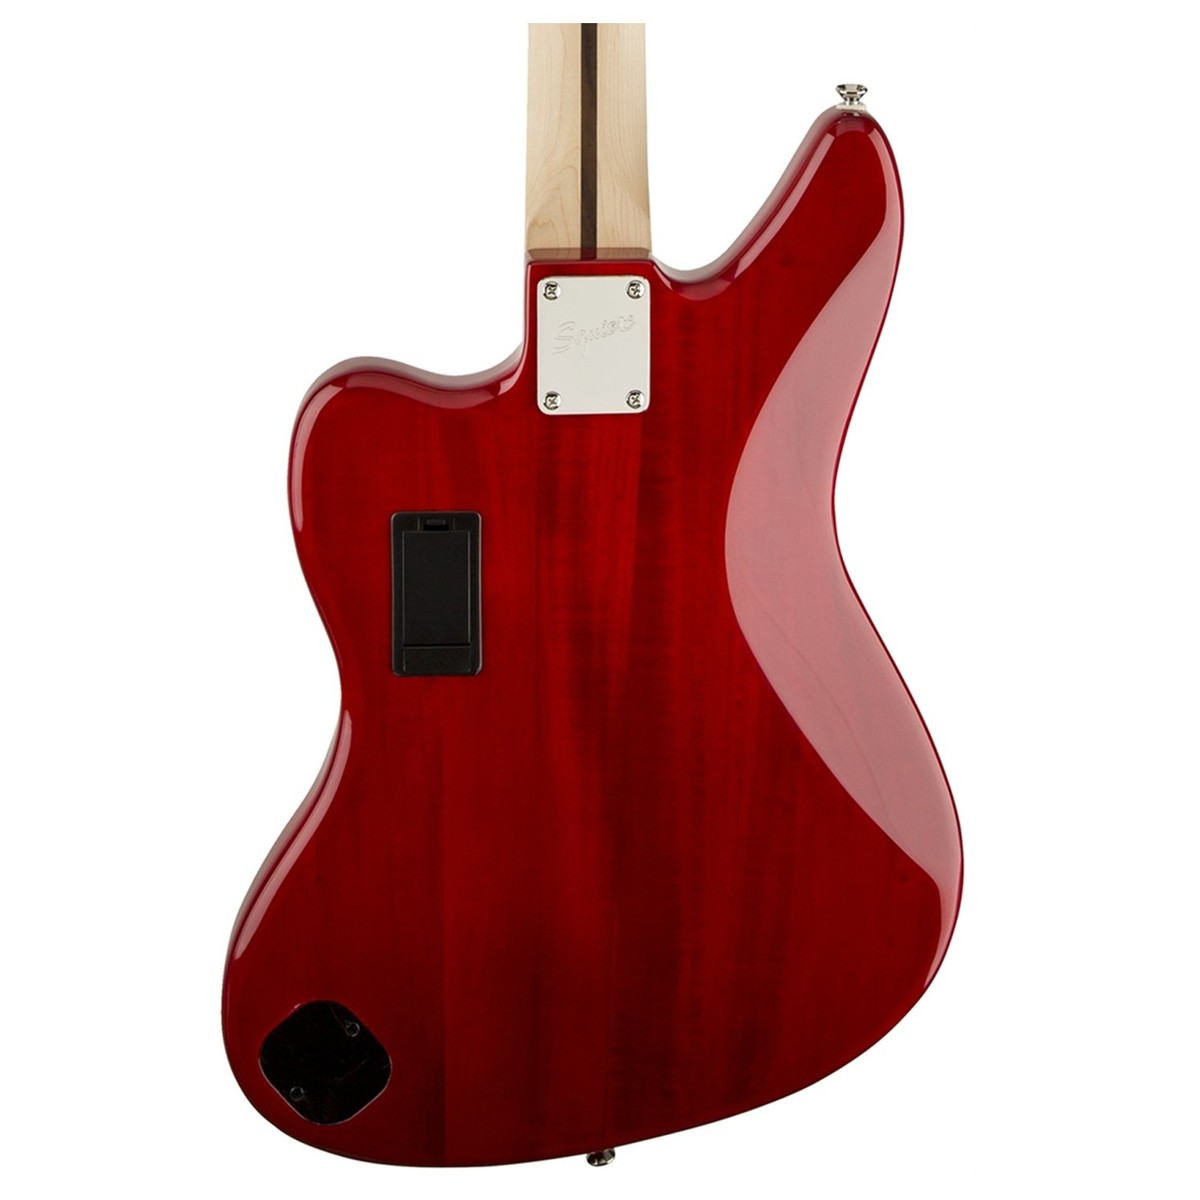 squier vintage modified jaguar bass special crimson red. Black Bedroom Furniture Sets. Home Design Ideas